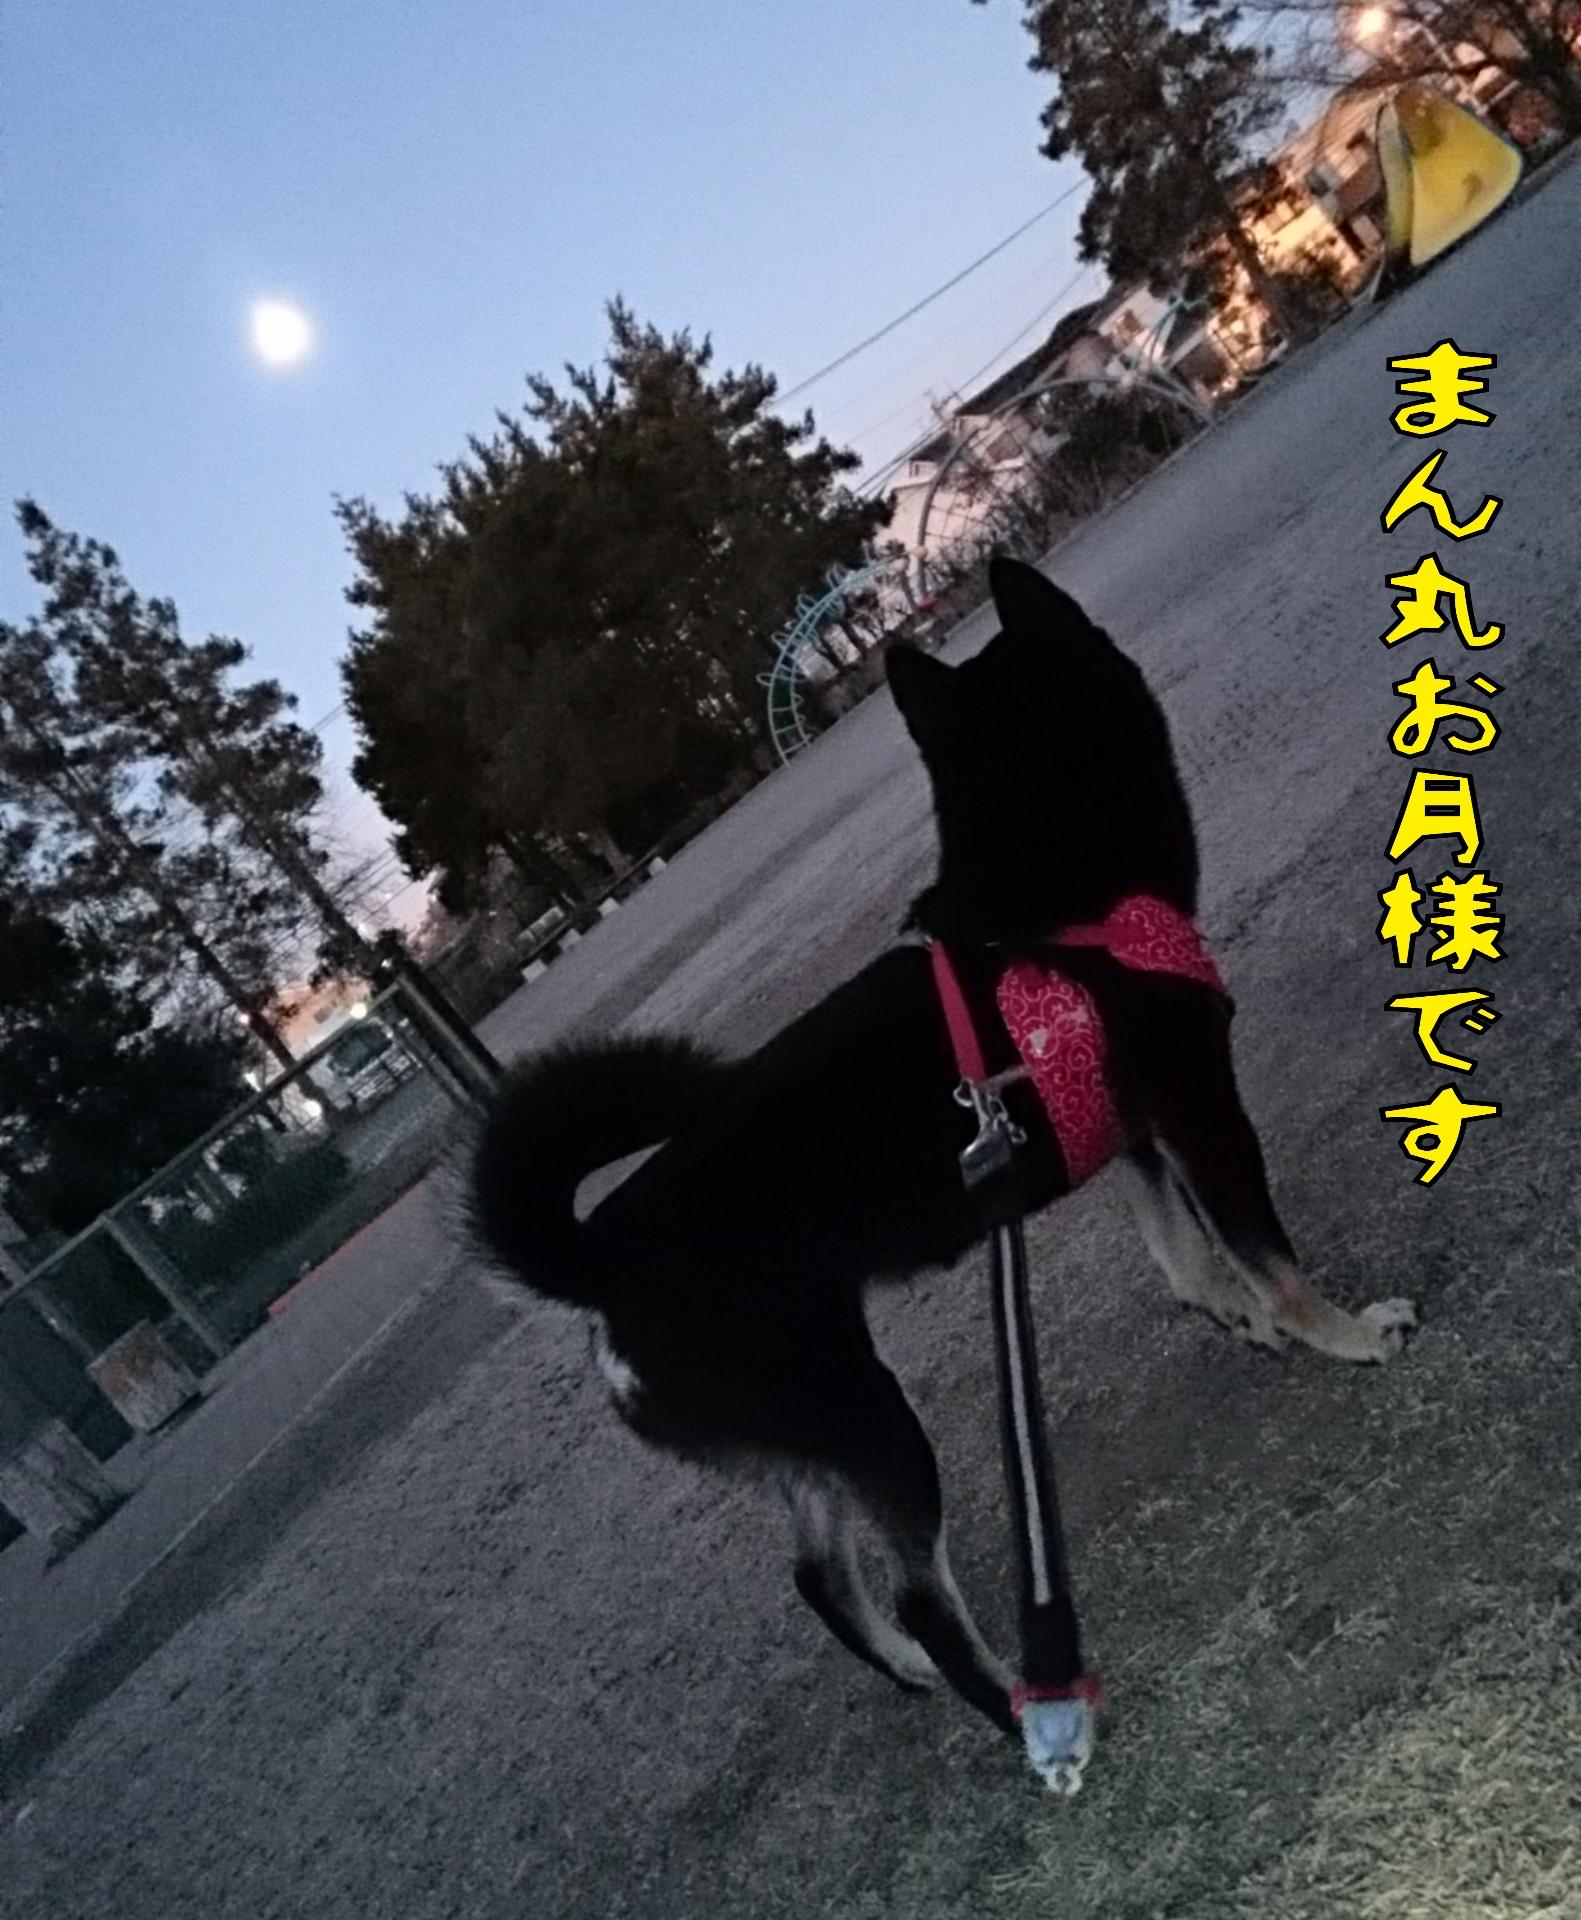 201601271908121a1.jpg